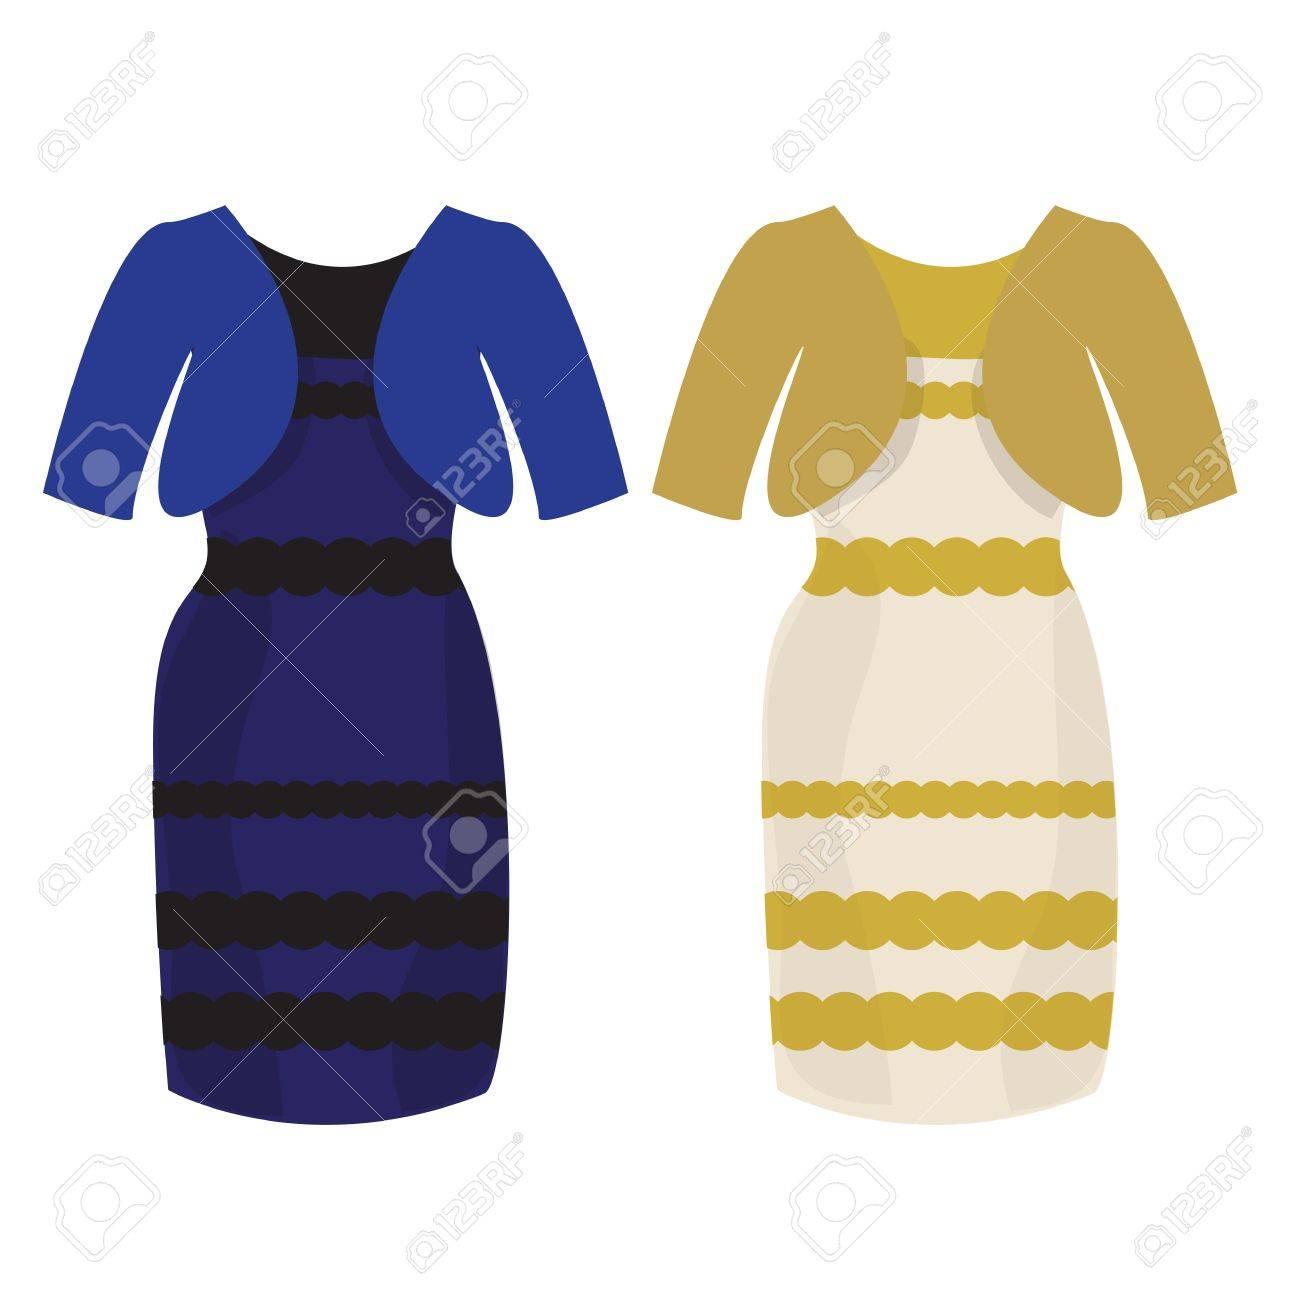 Dress color gold white or black